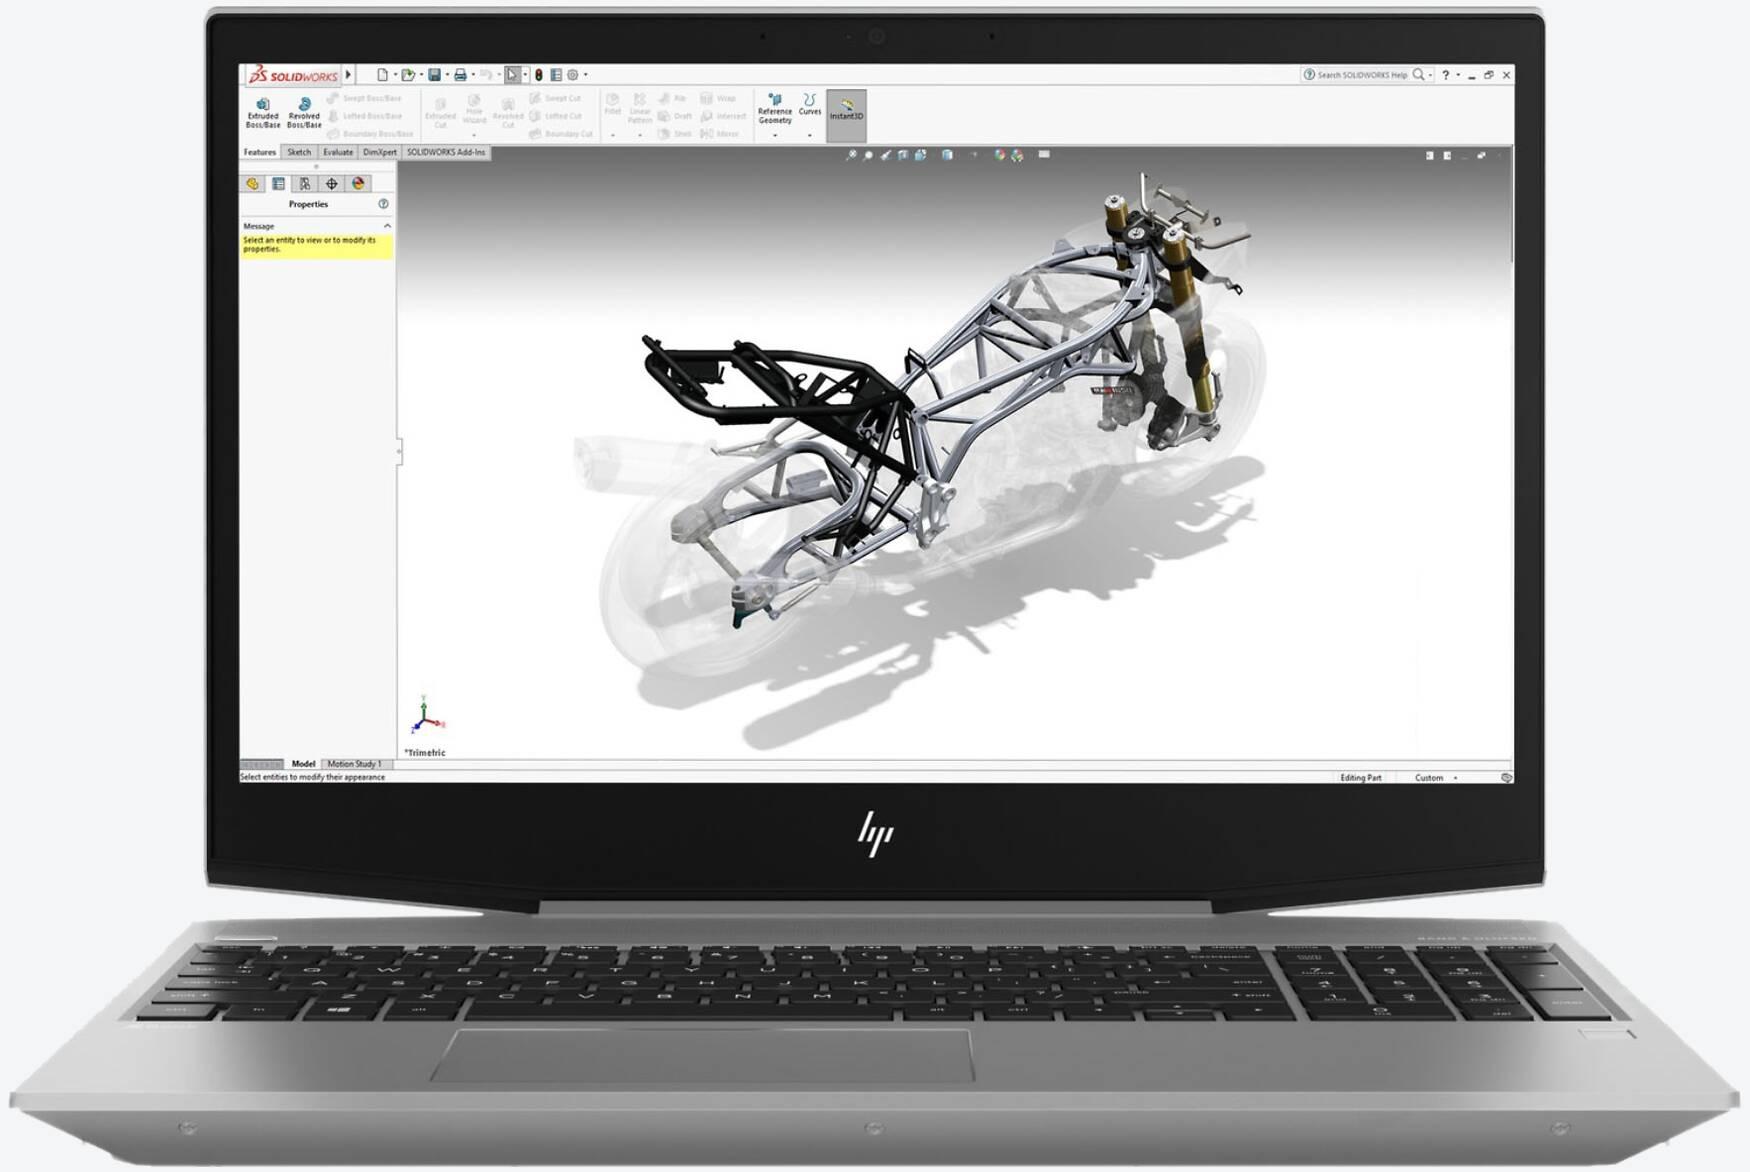 HP ZBook 15v G5 (4QH78EA)